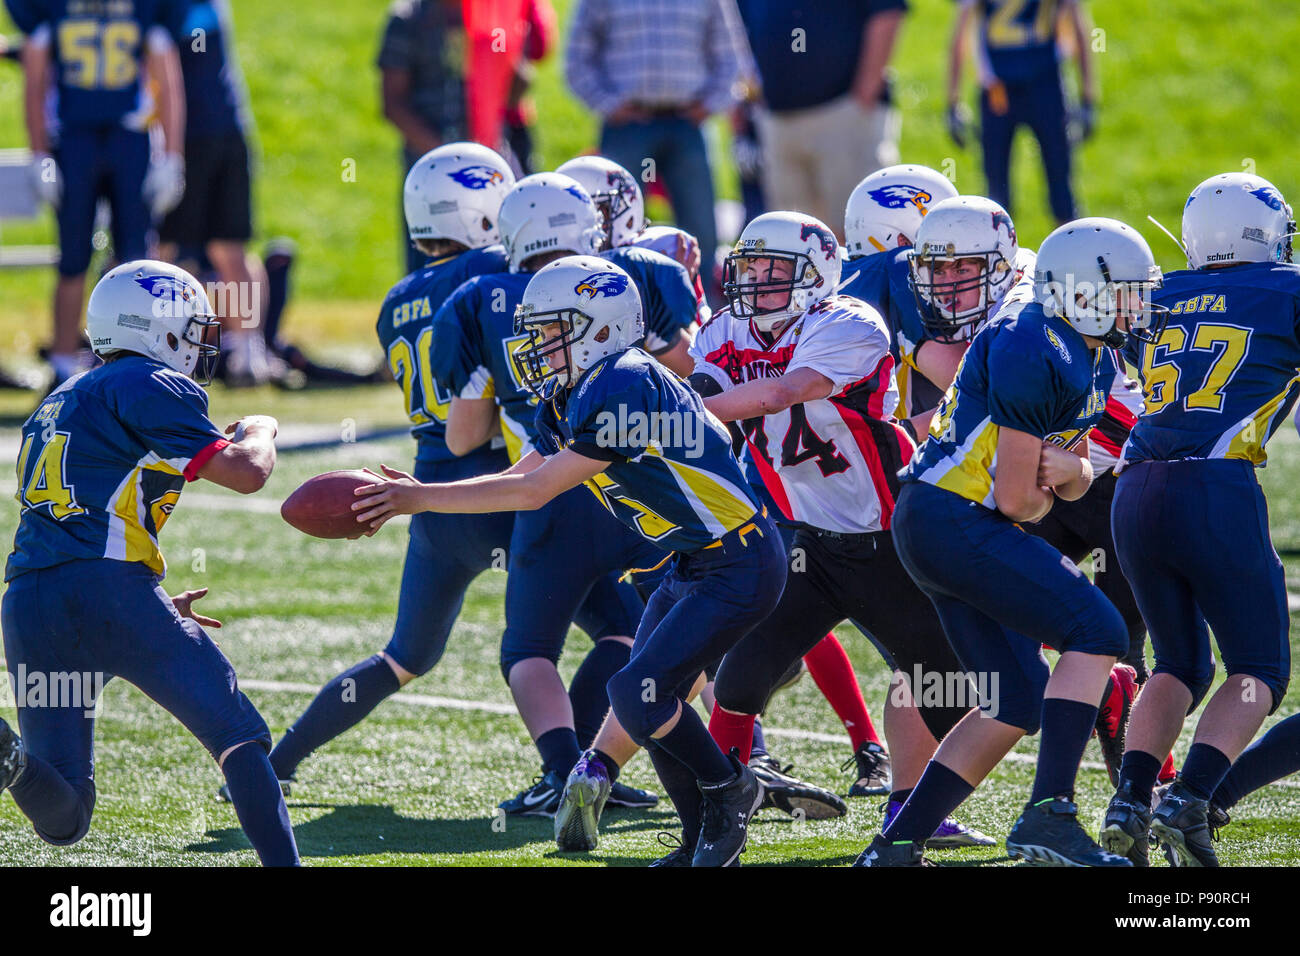 Dramatic, colorful action photo's of handoff during Boys Bantam football in Calgary, Alberta, Canada - Stock Image